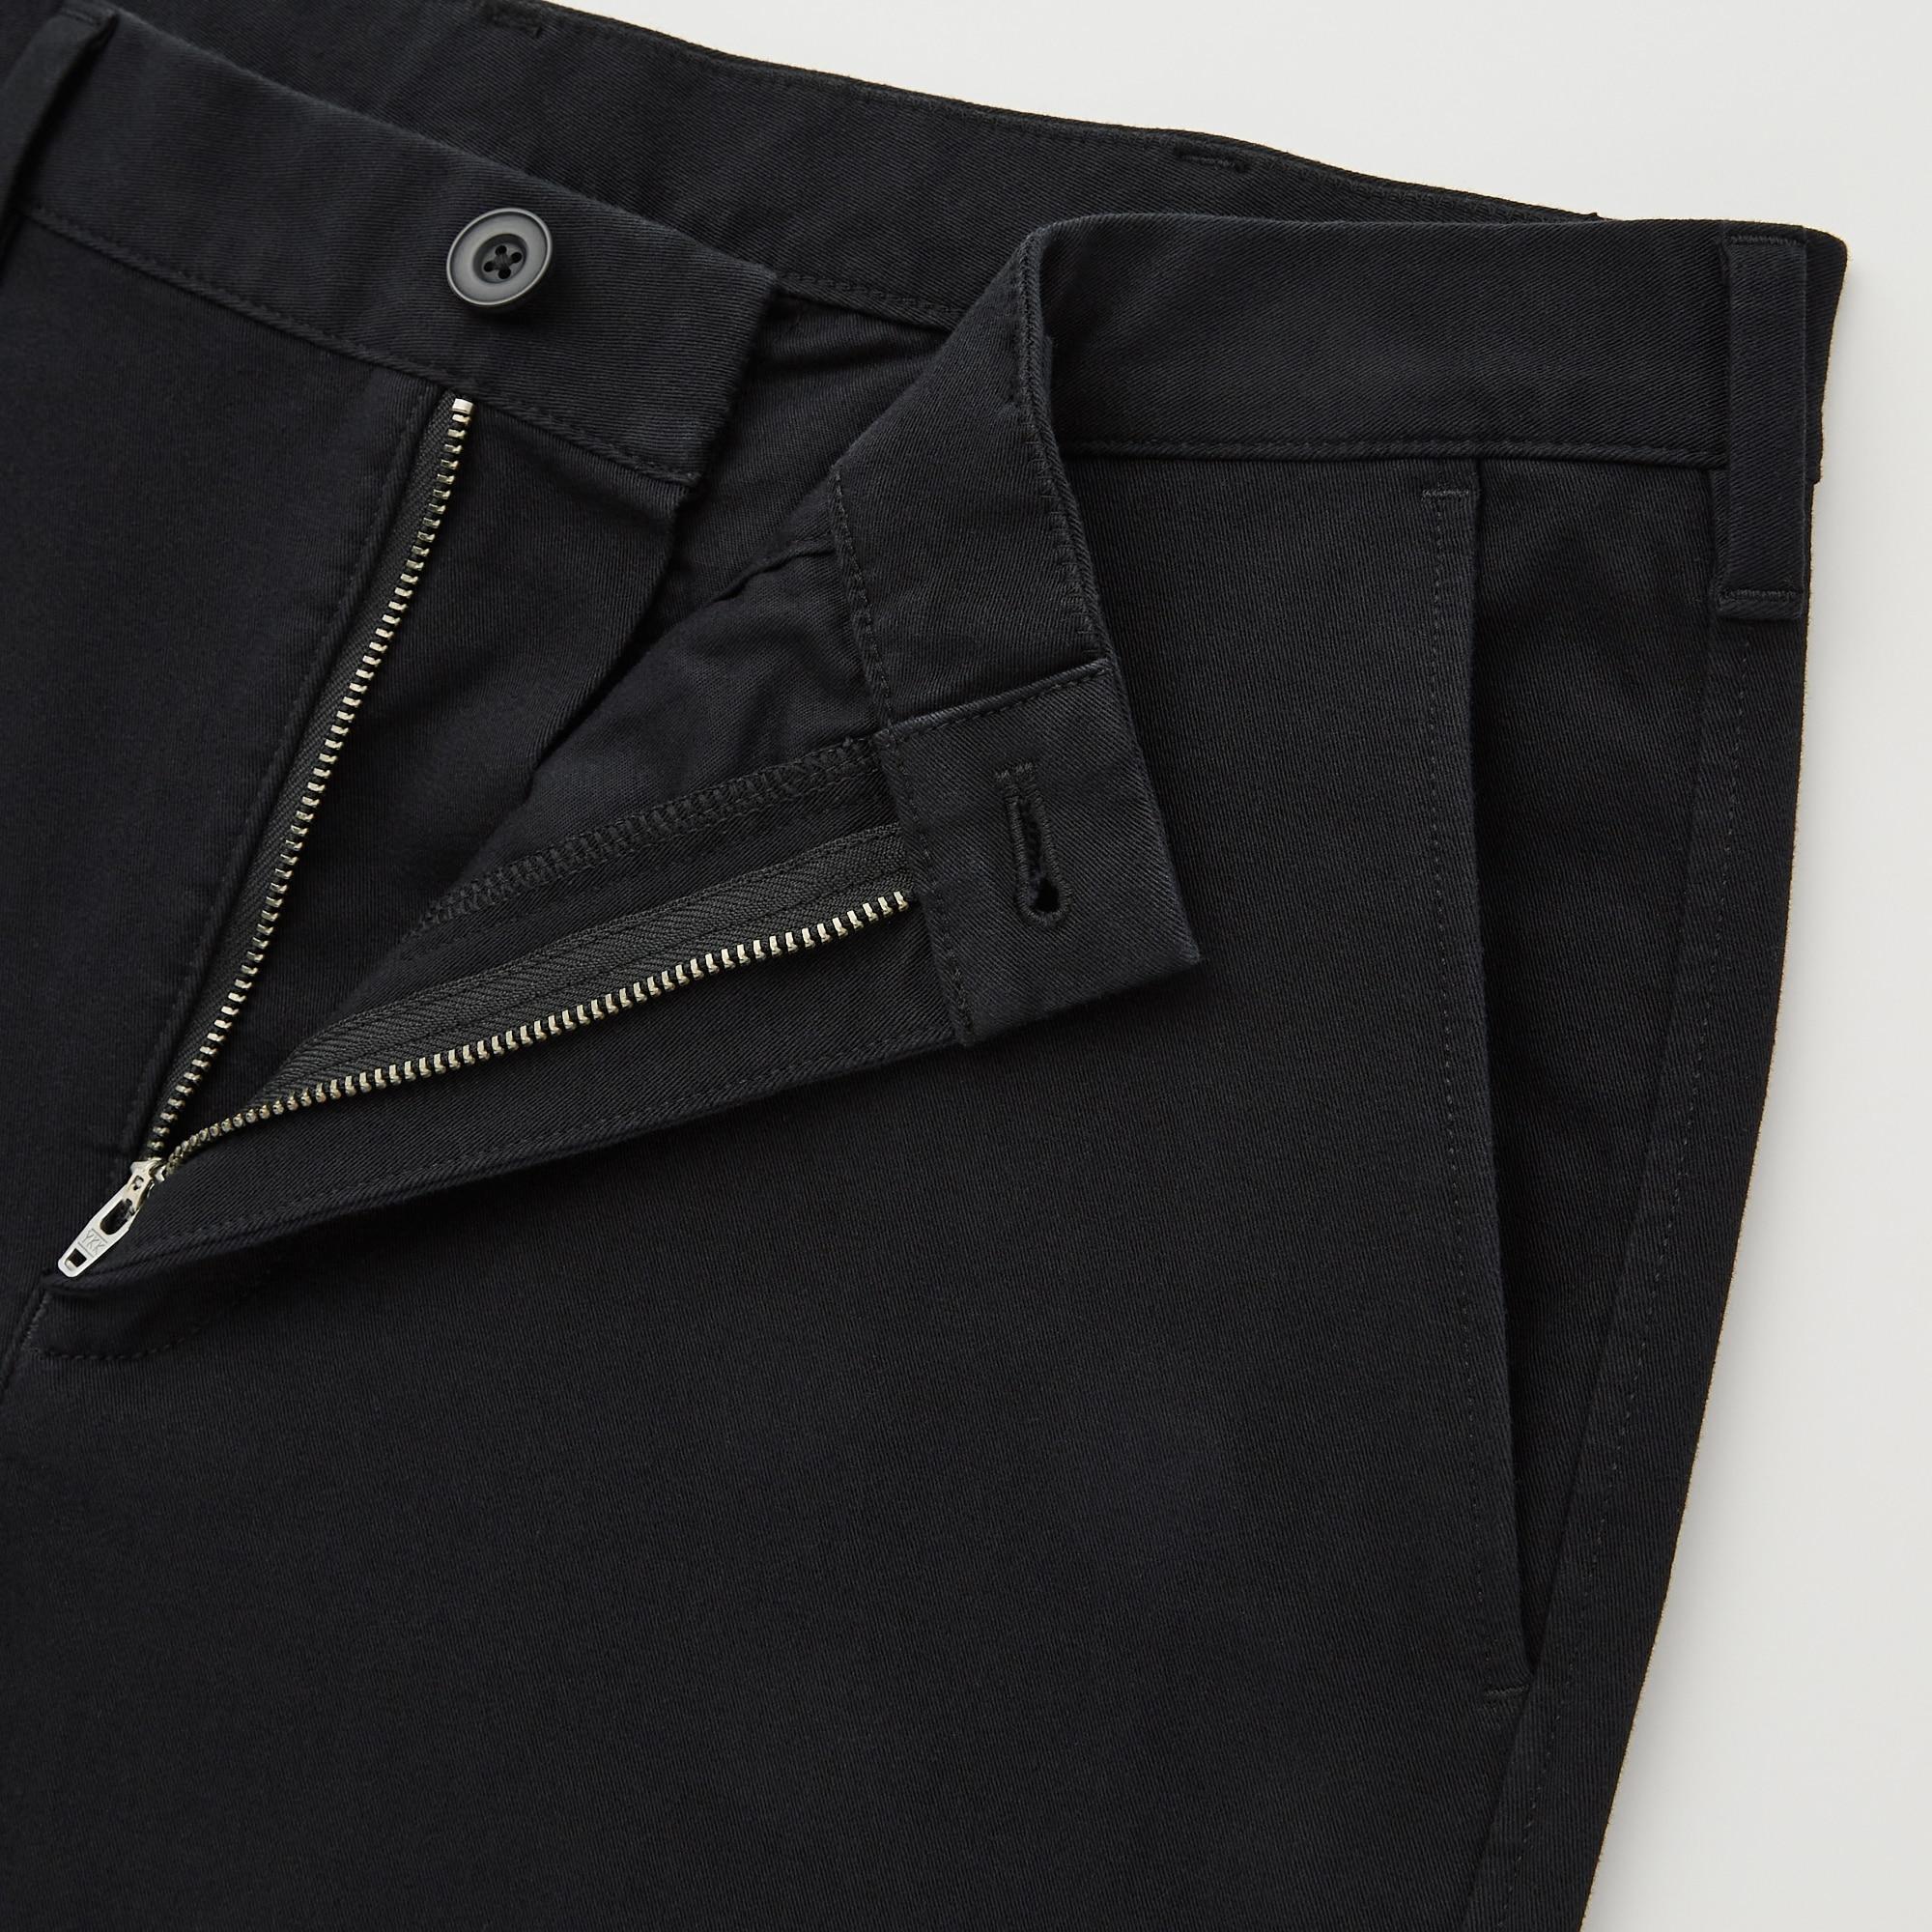 Pantalon Toile Chino Homme Coton Stretch Coupe Slim Skinny d/écontract/ée